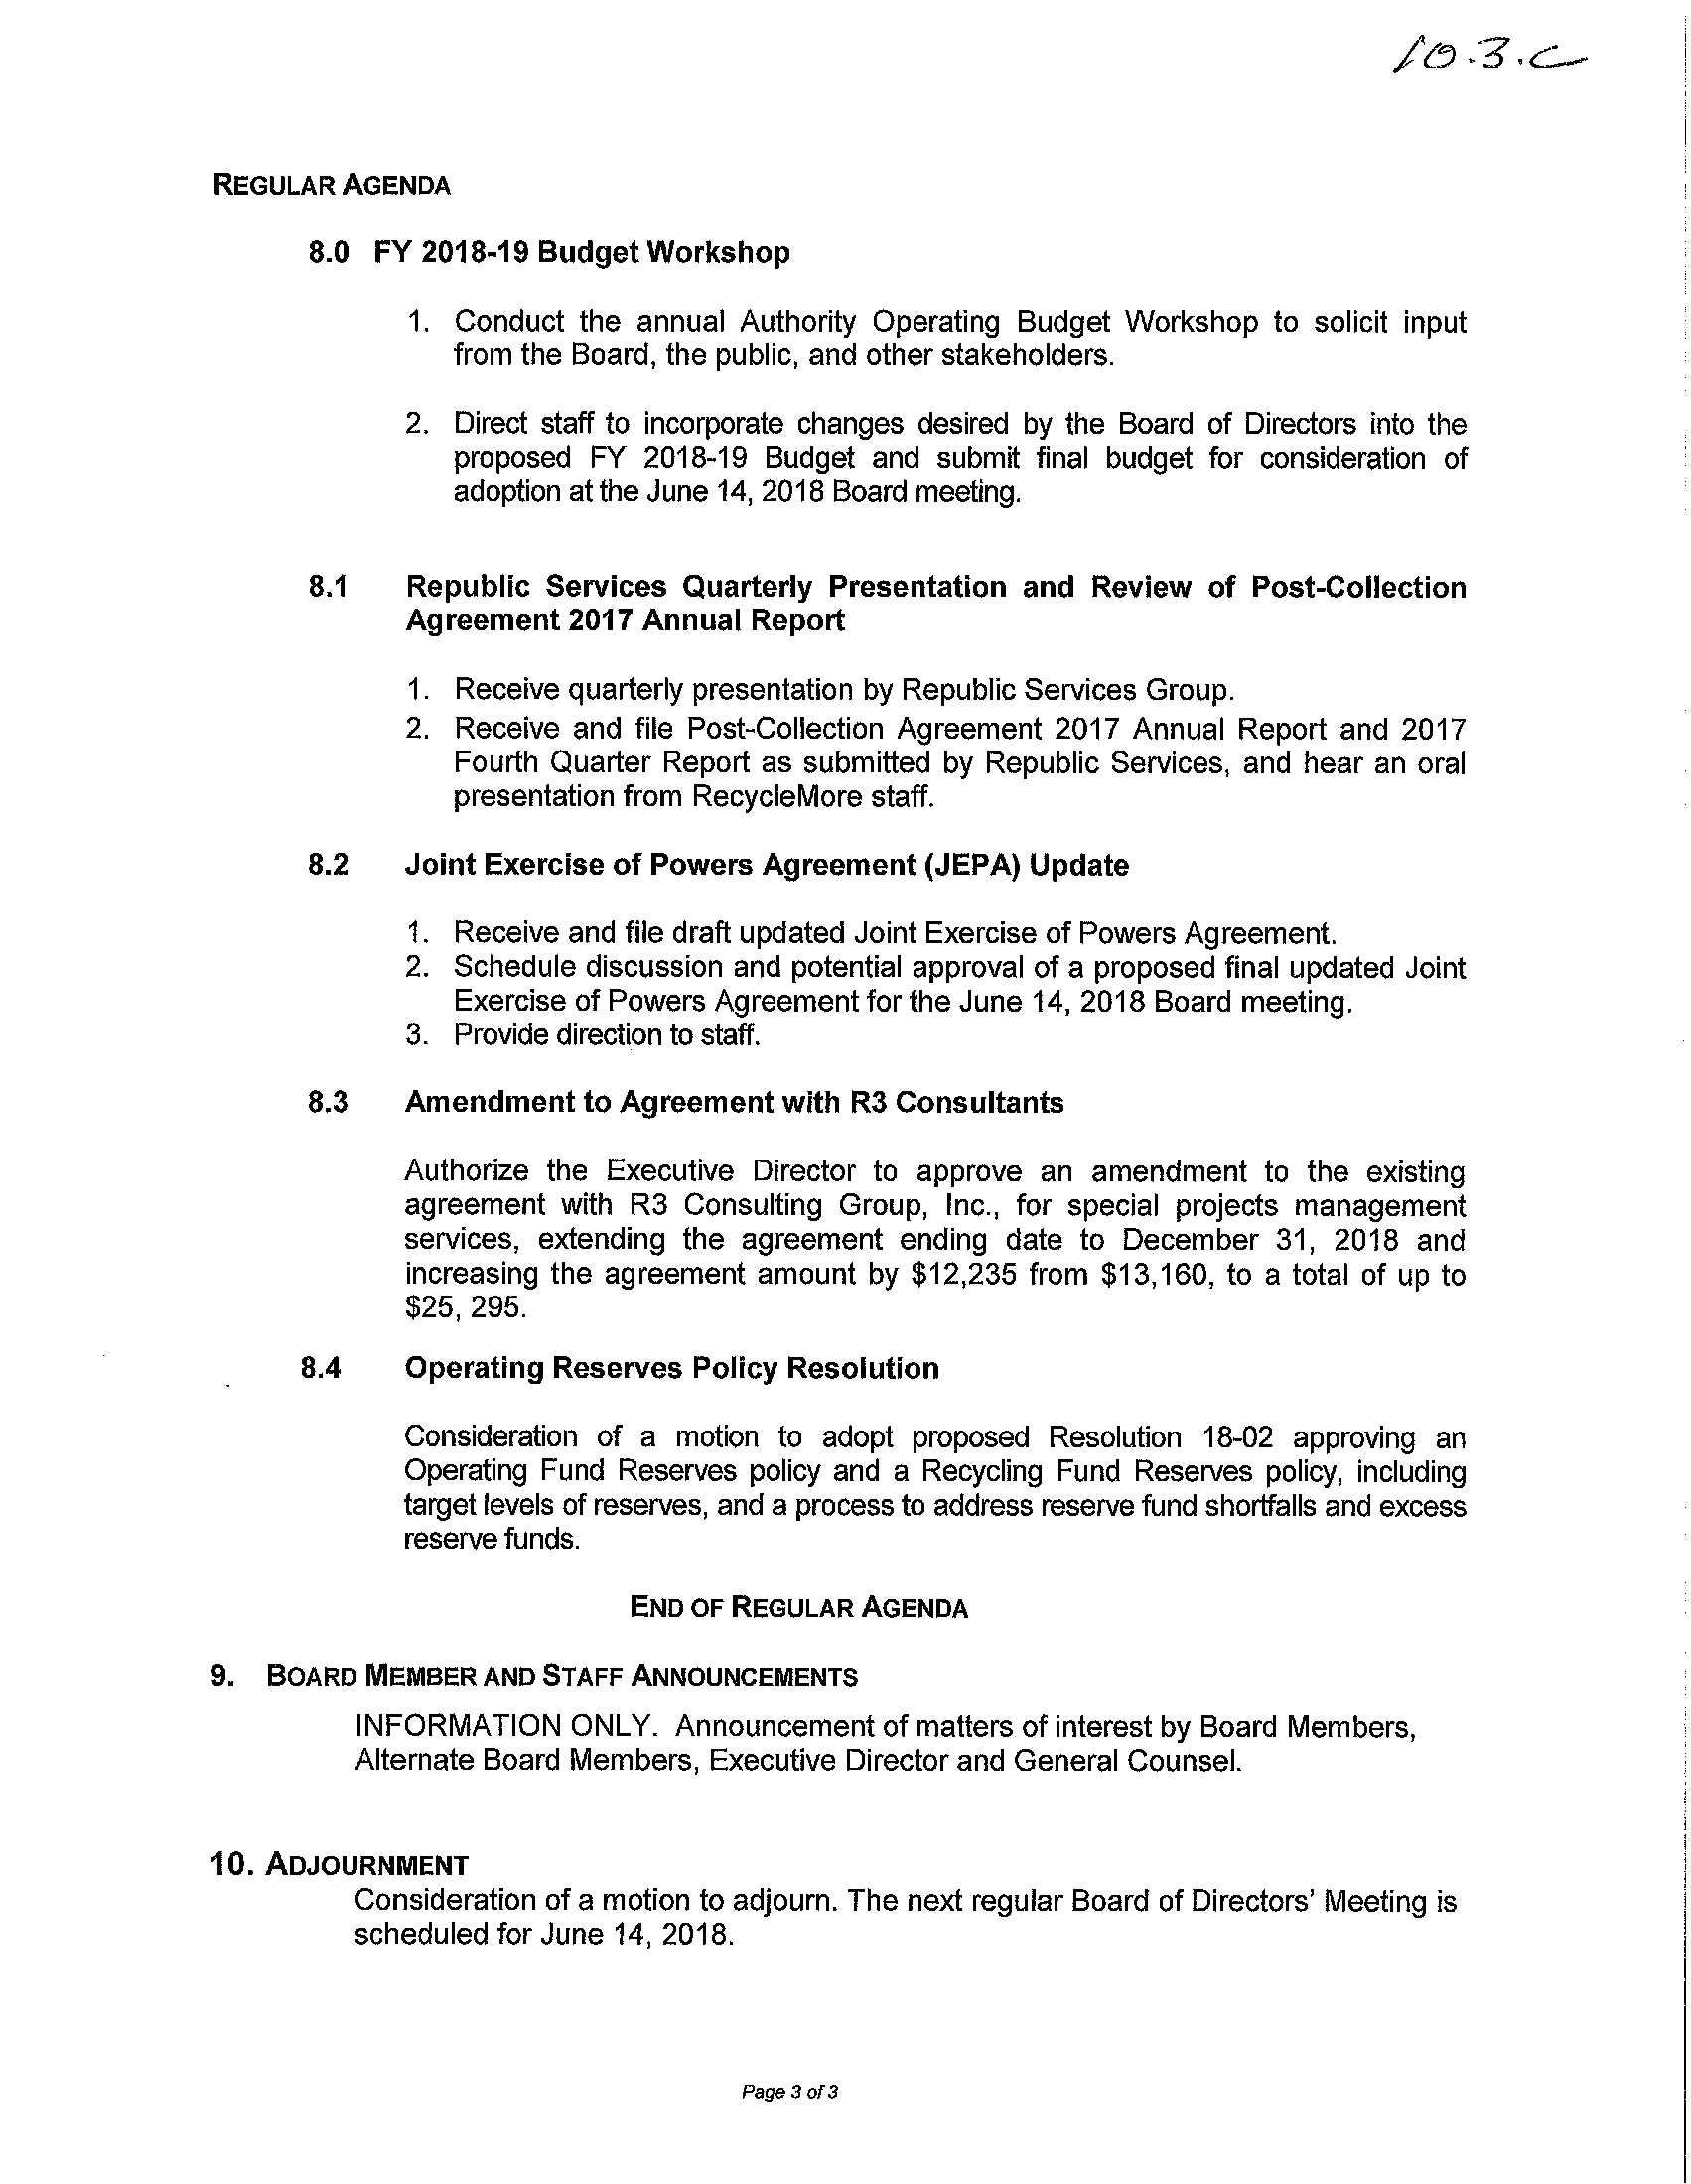 ESMAC Agenda 6.13.2018 (30 Pages)_18.jpg